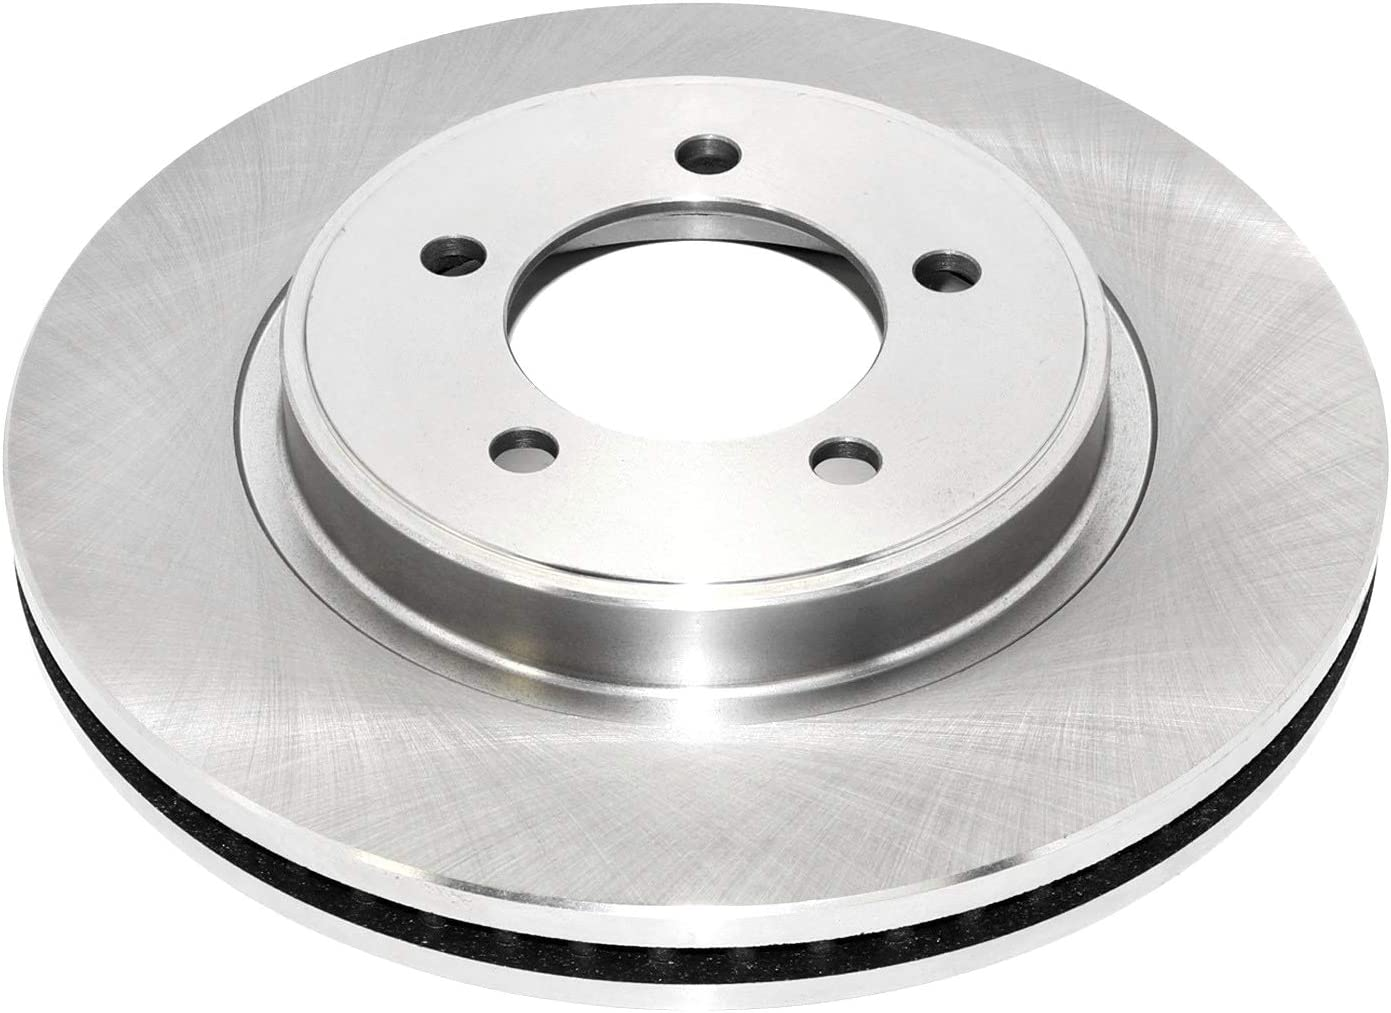 Dura International BR5414302 Front Vented Disc Premium Electrophoretic Brake Rotor